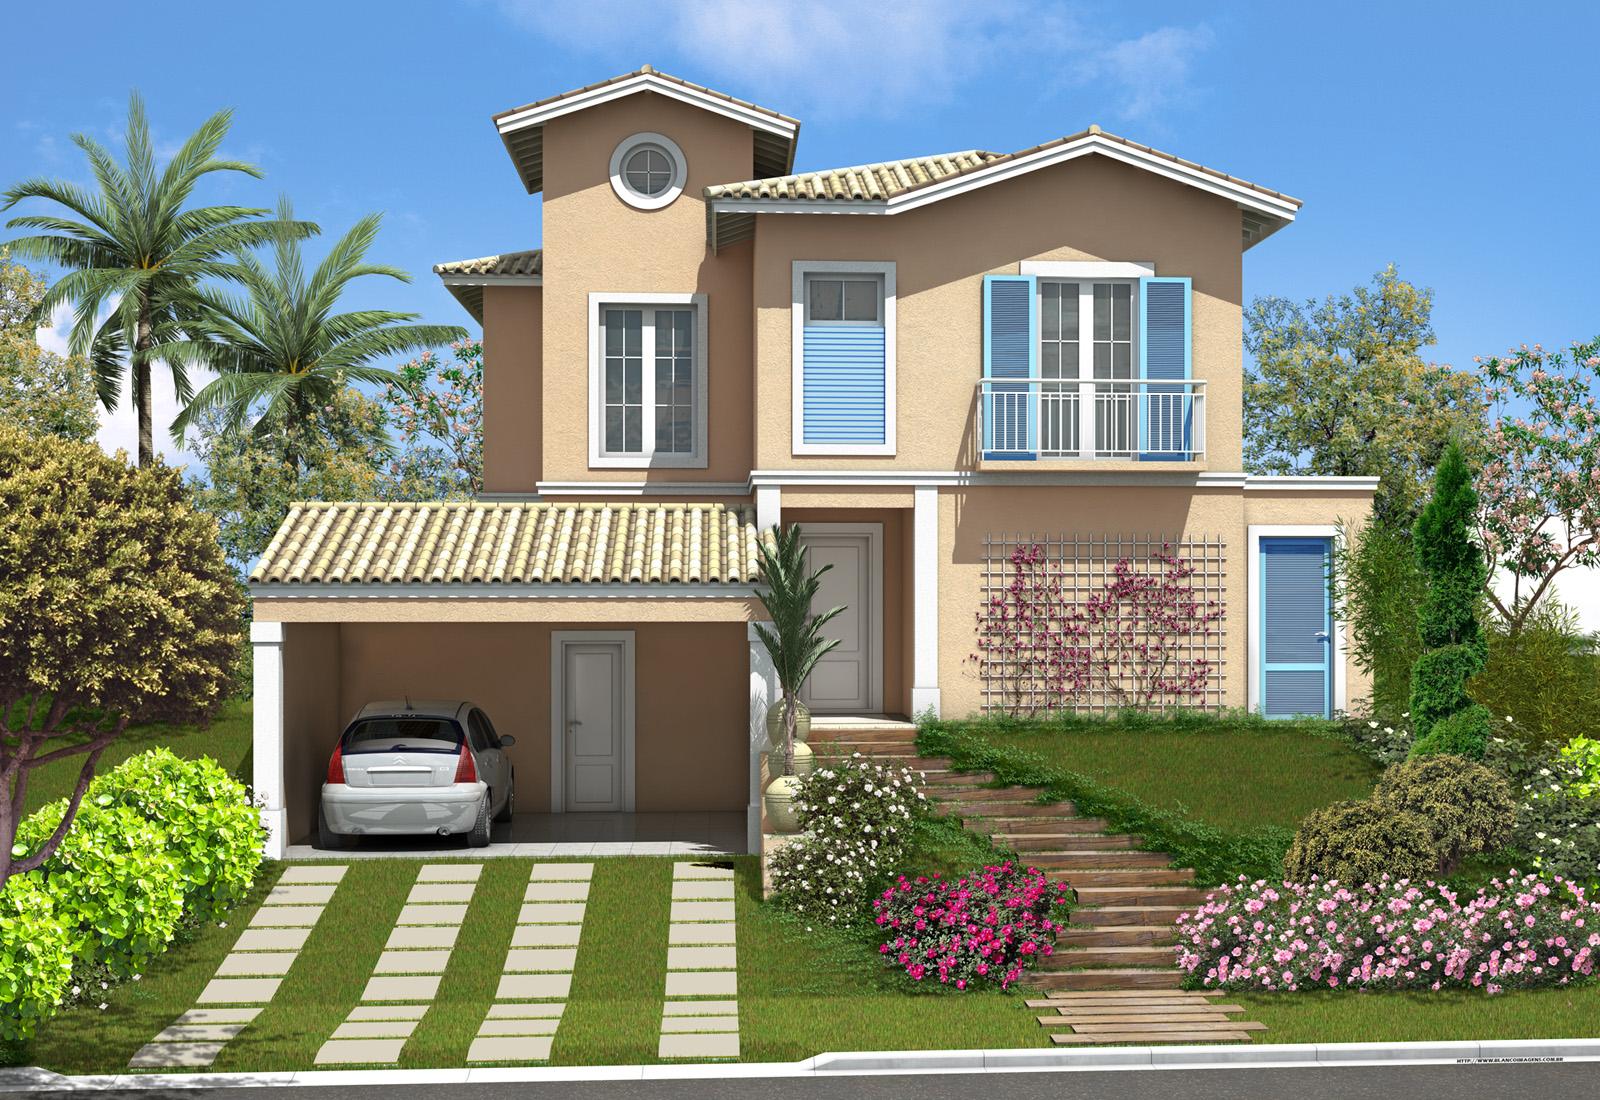 A fachada da sua casa emile m veis for Fachada de casas modernas lujosas